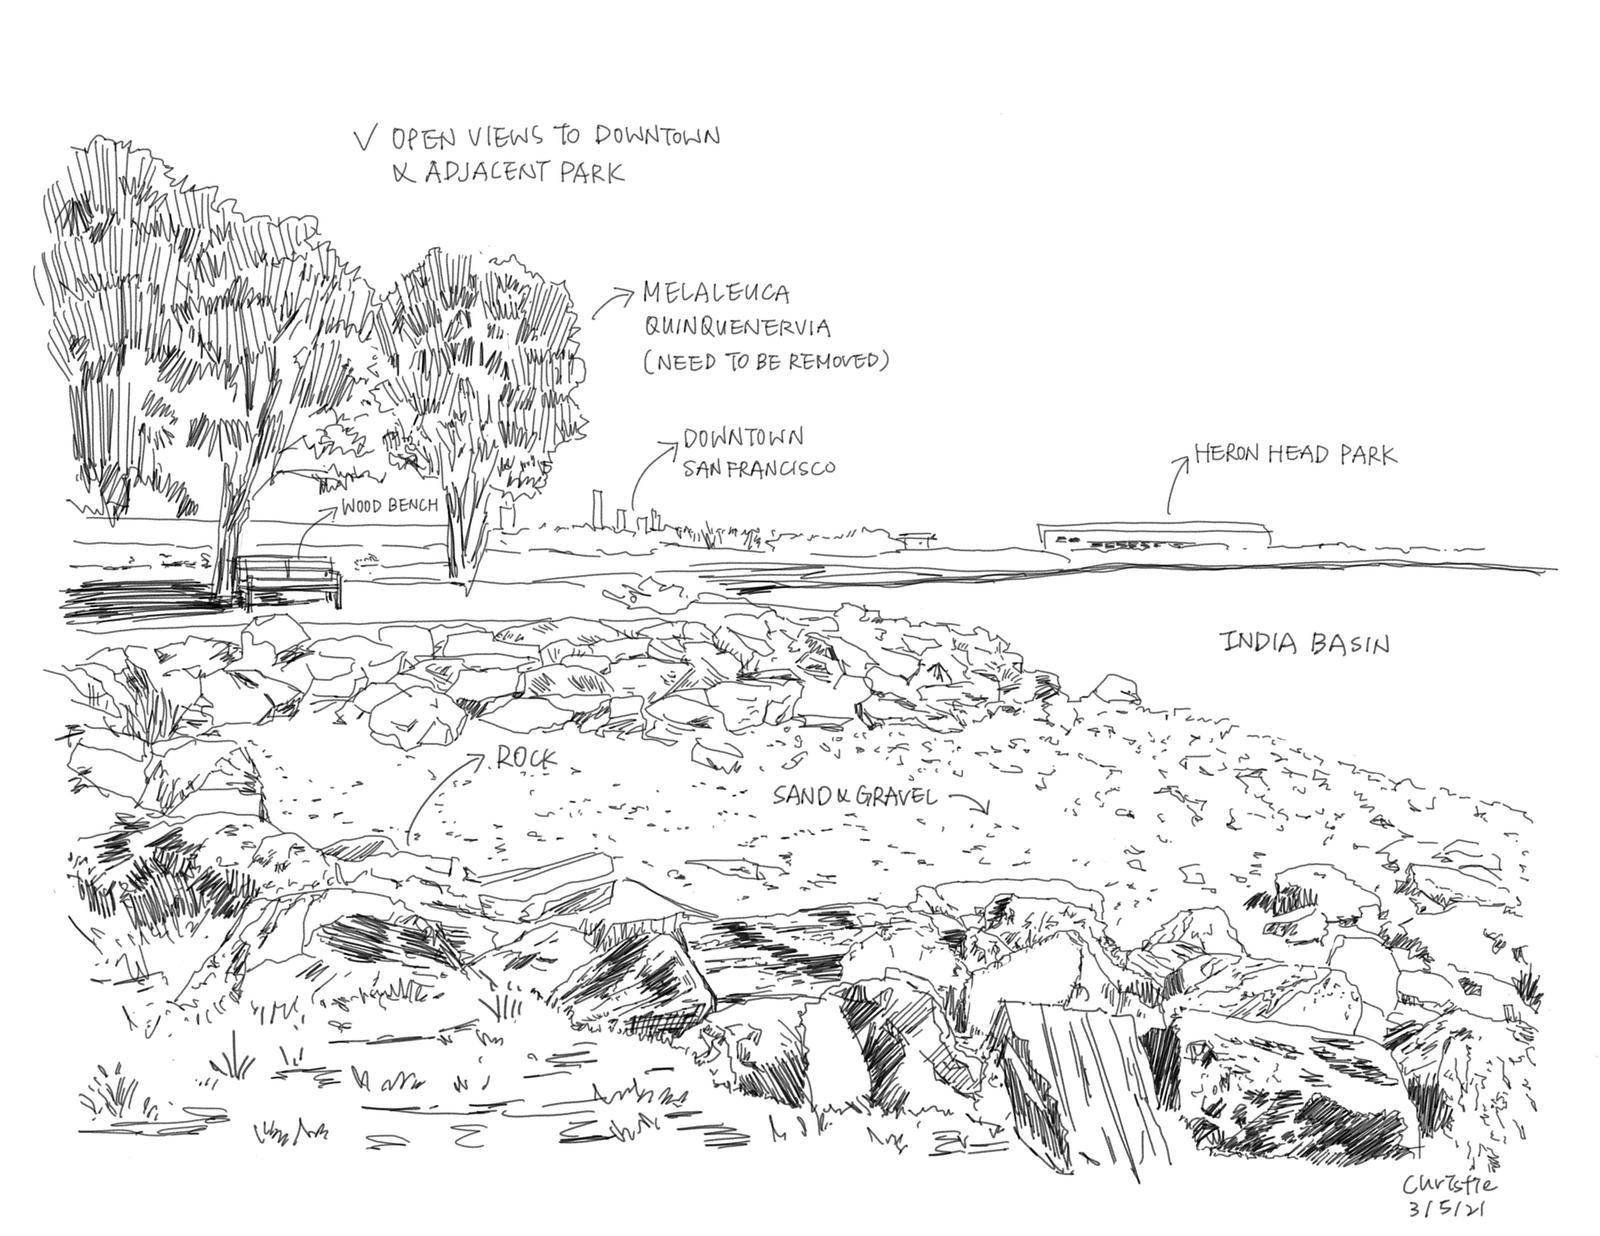 India Basin Park, San Francisco - Site Inventory Sketch 2